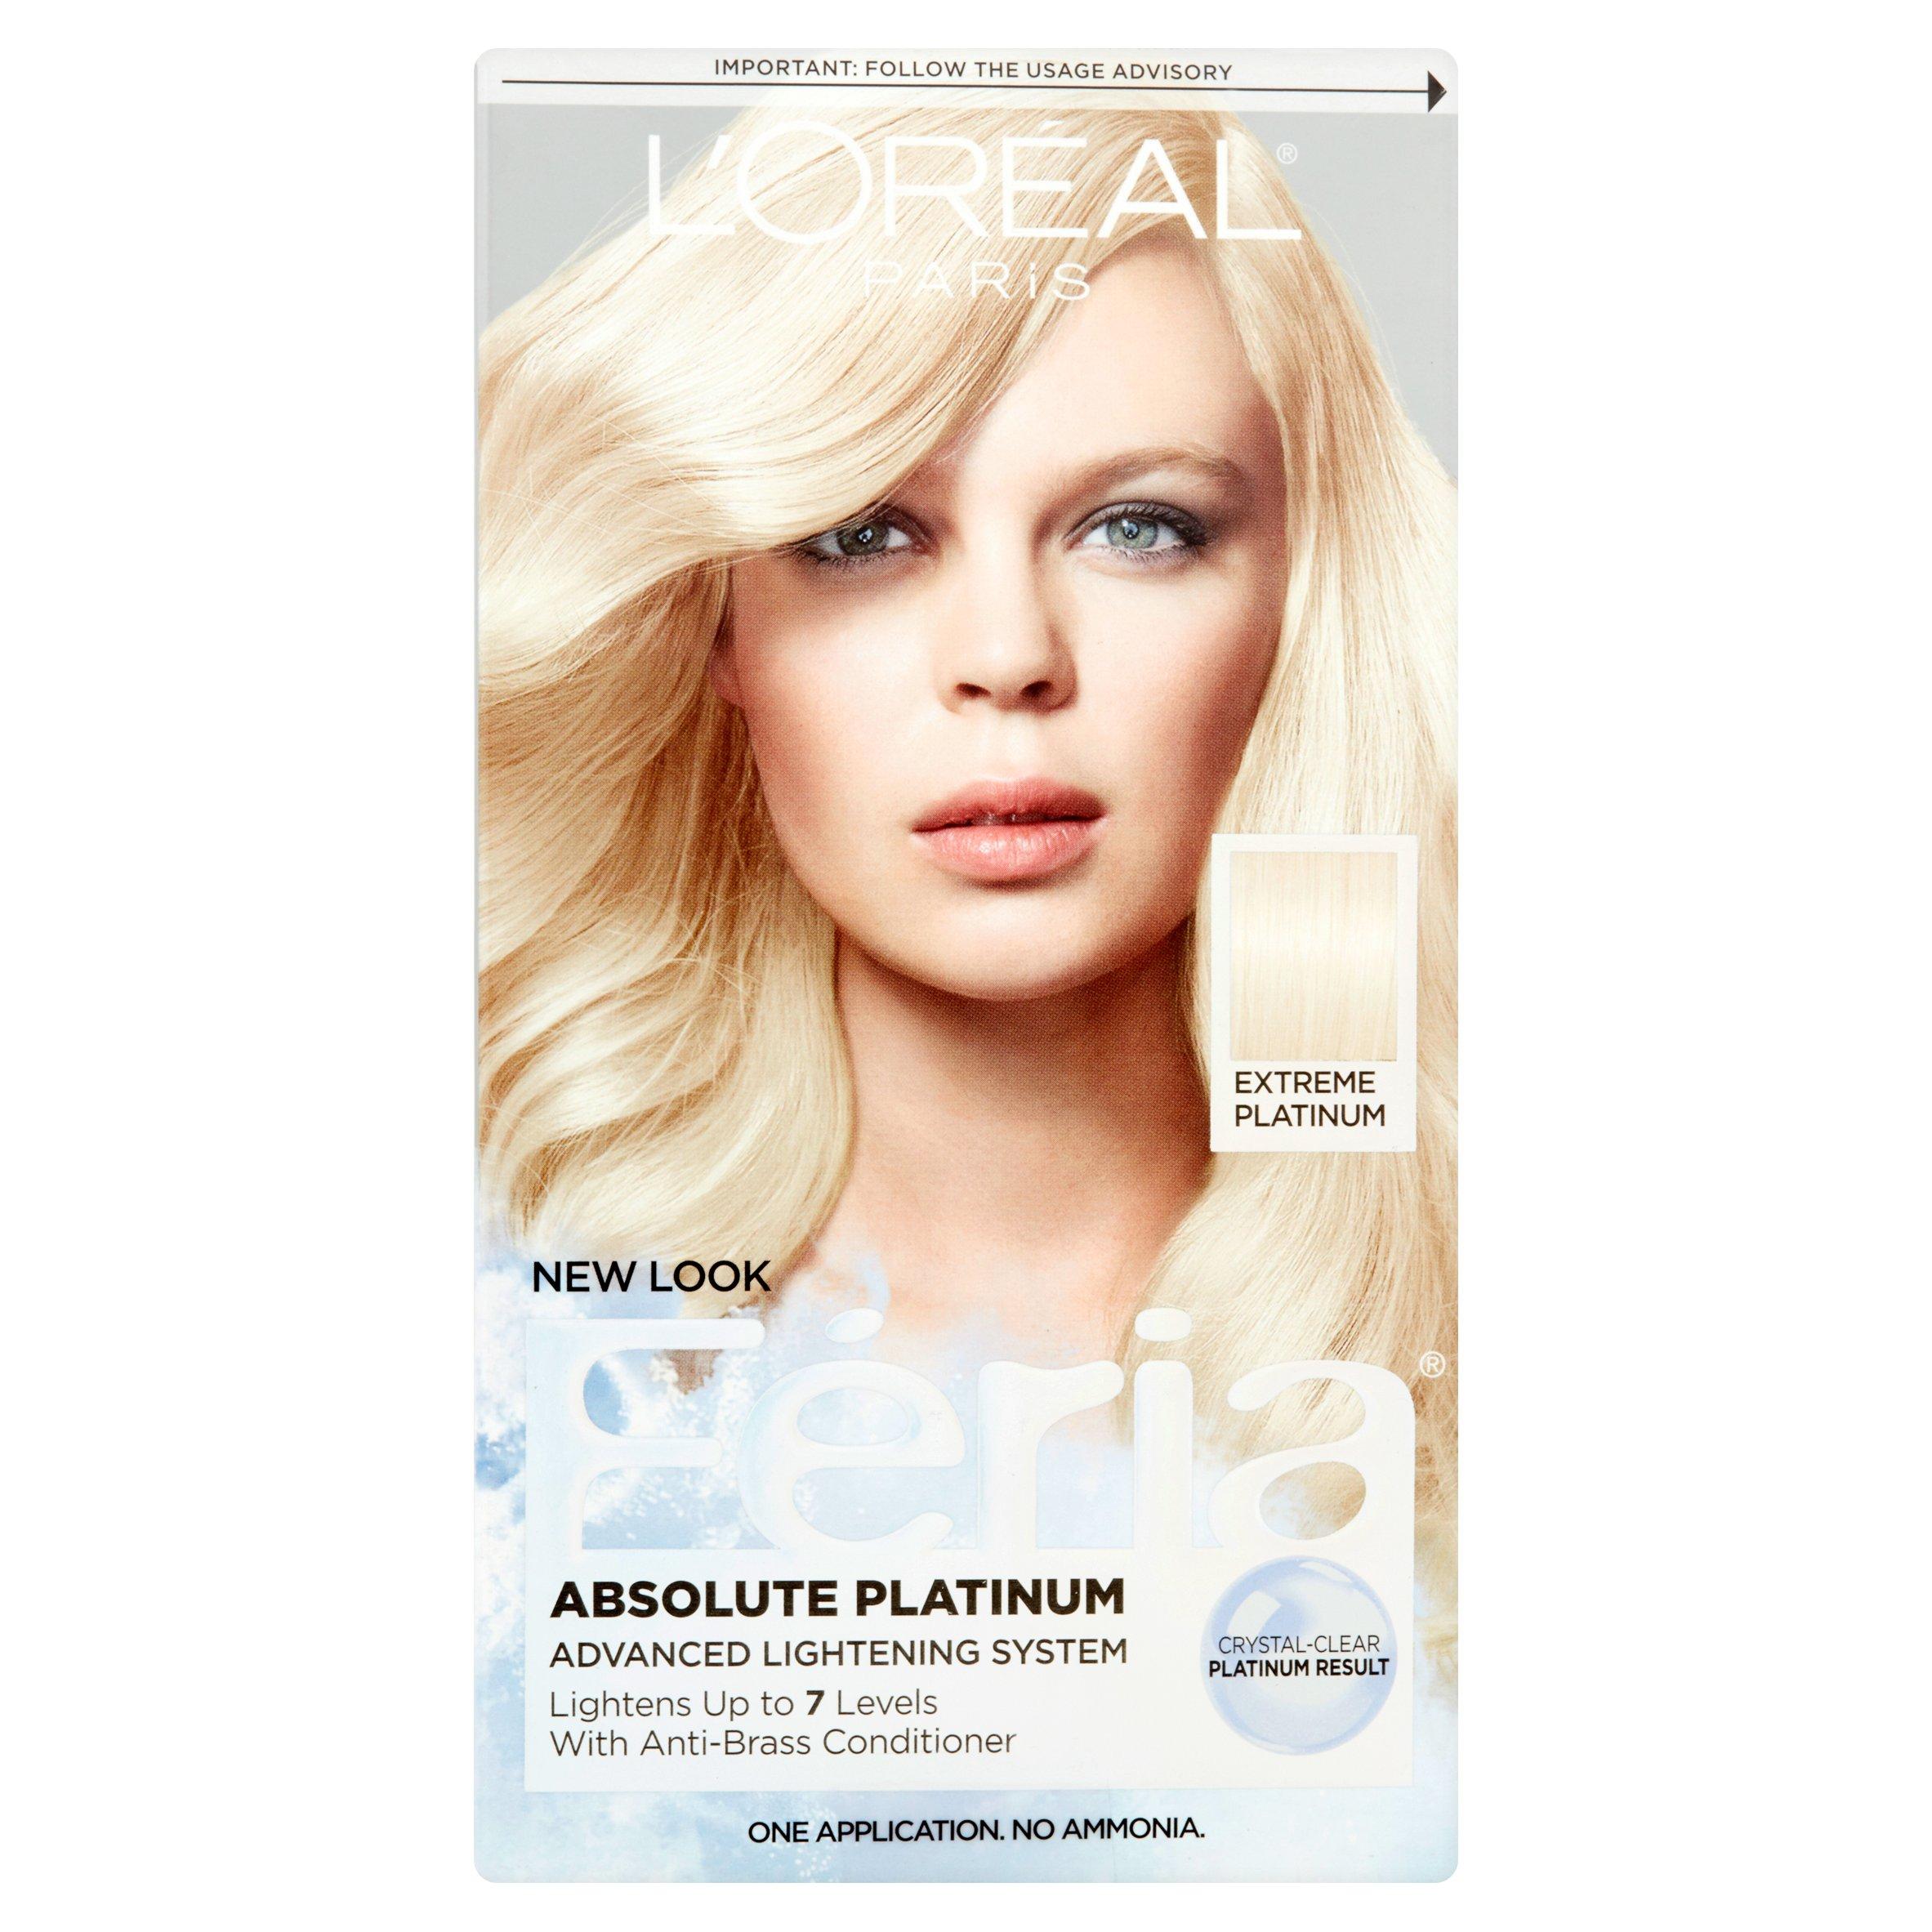 L'Oreal Paris Feria Absolute Platinum Advanced Lightening Haircolor - Walmart.com